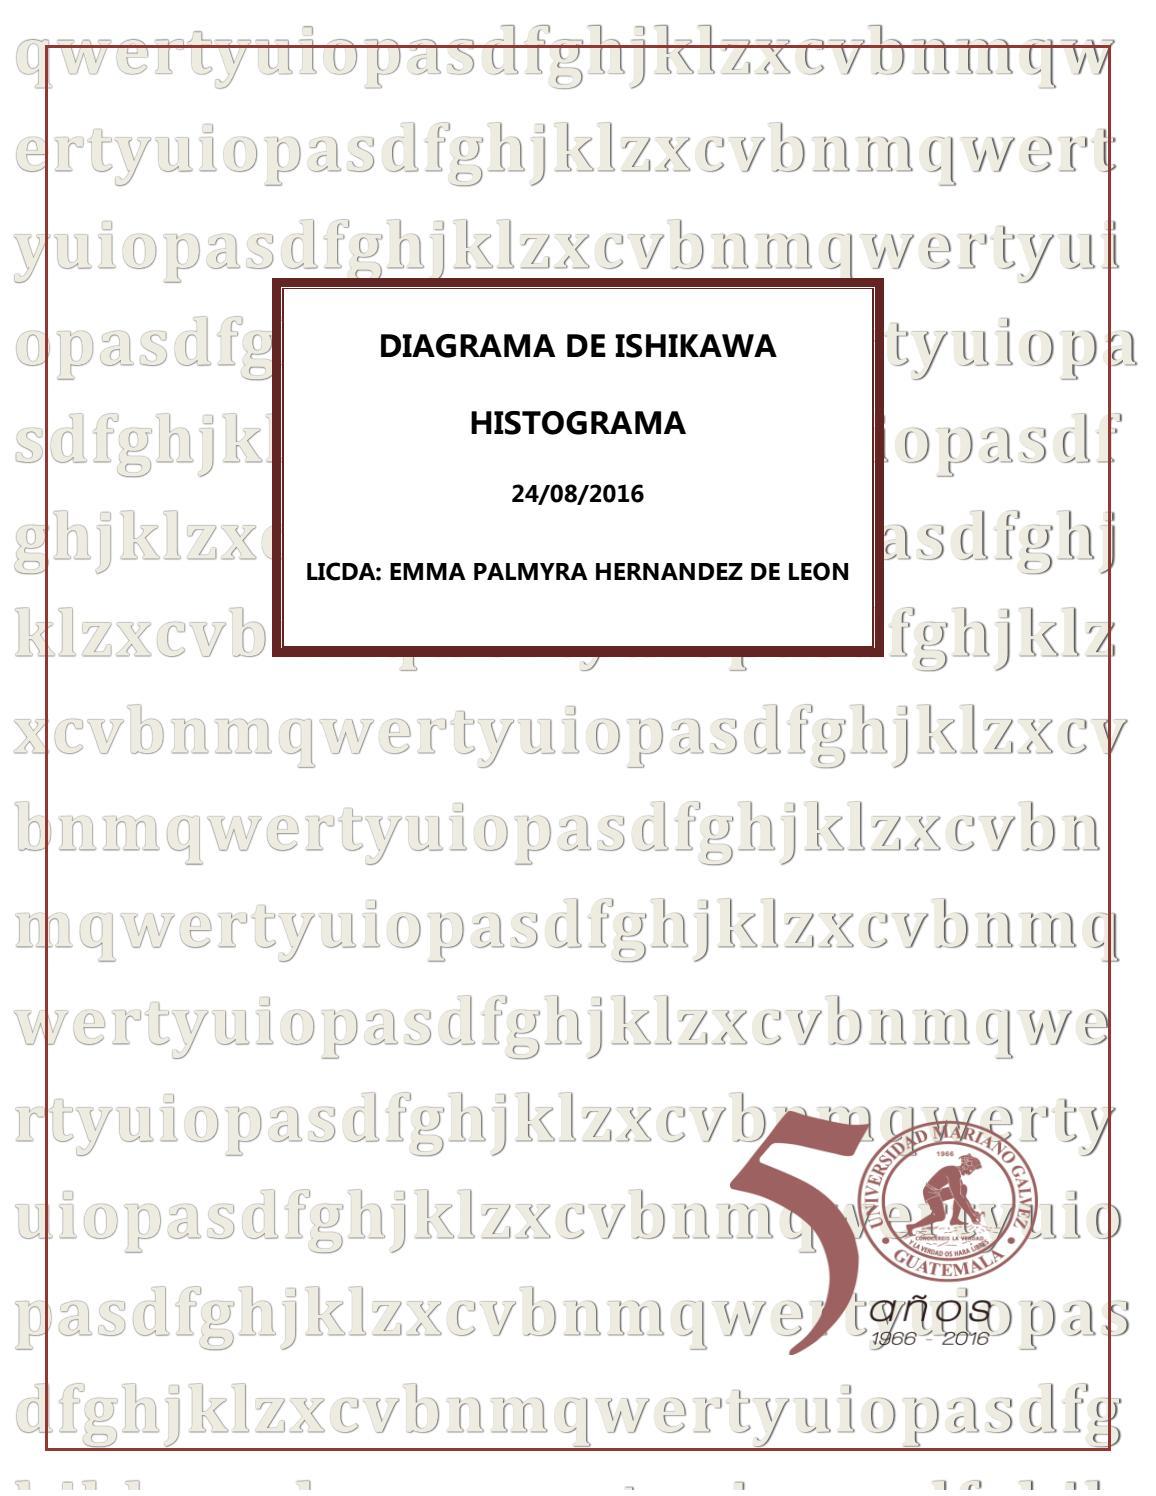 Diagrama de ishikawa y histograma by Palmyrita Hernández - issuu